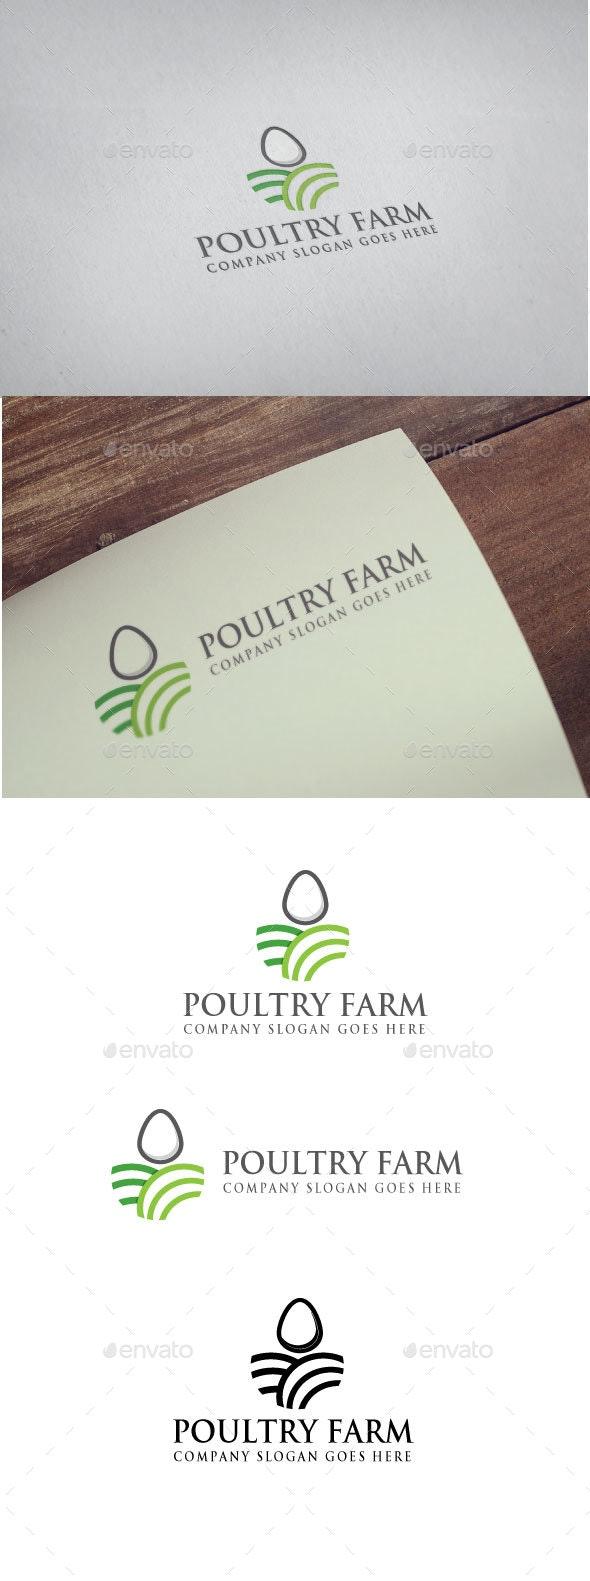 Poultry Farm logo - Nature Logo Templates